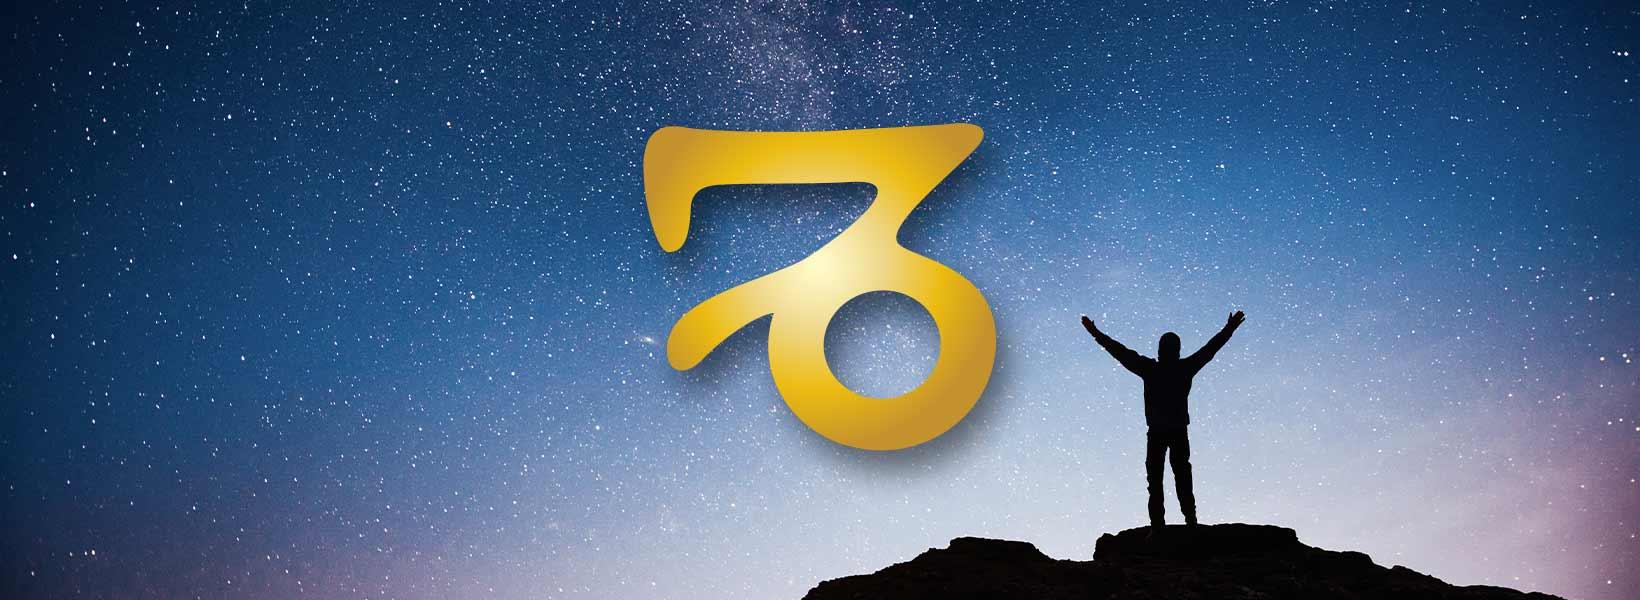 horoscop capricorn 2021